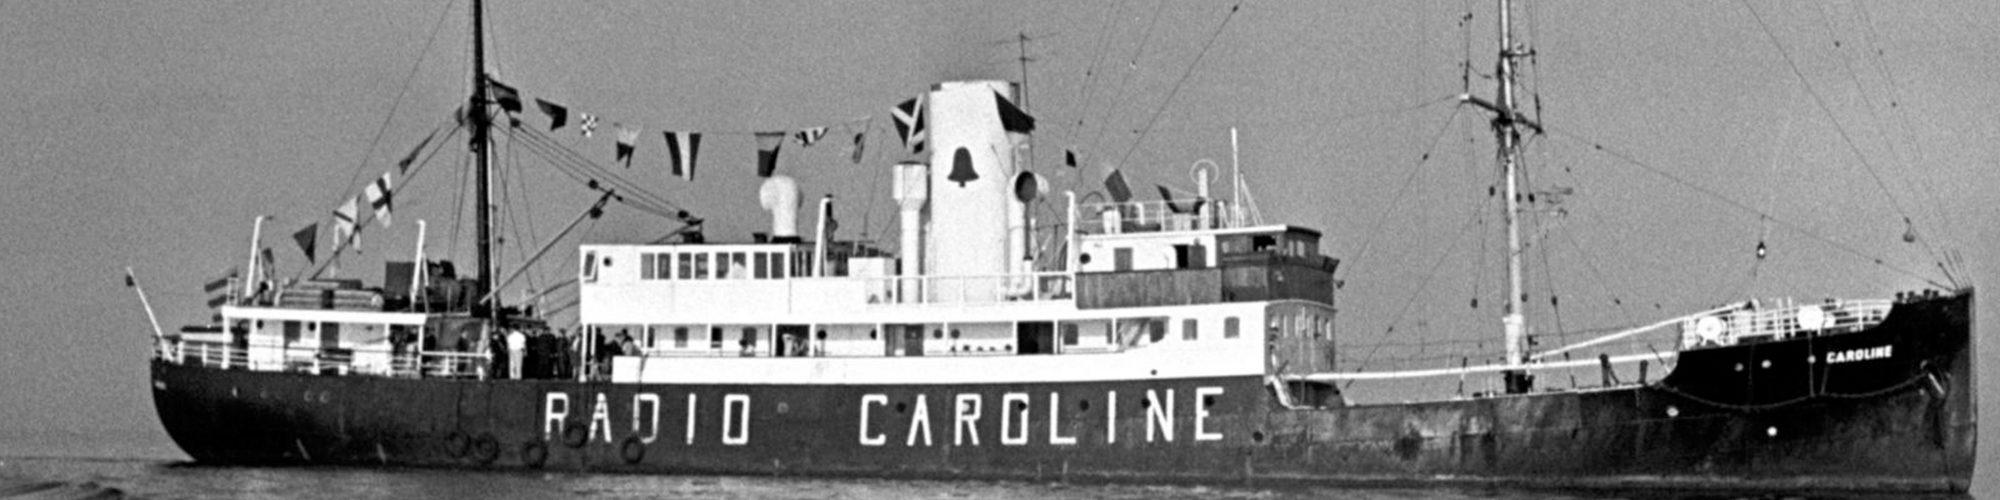 Why the British elites were determined to suppress 'pirate' radio |